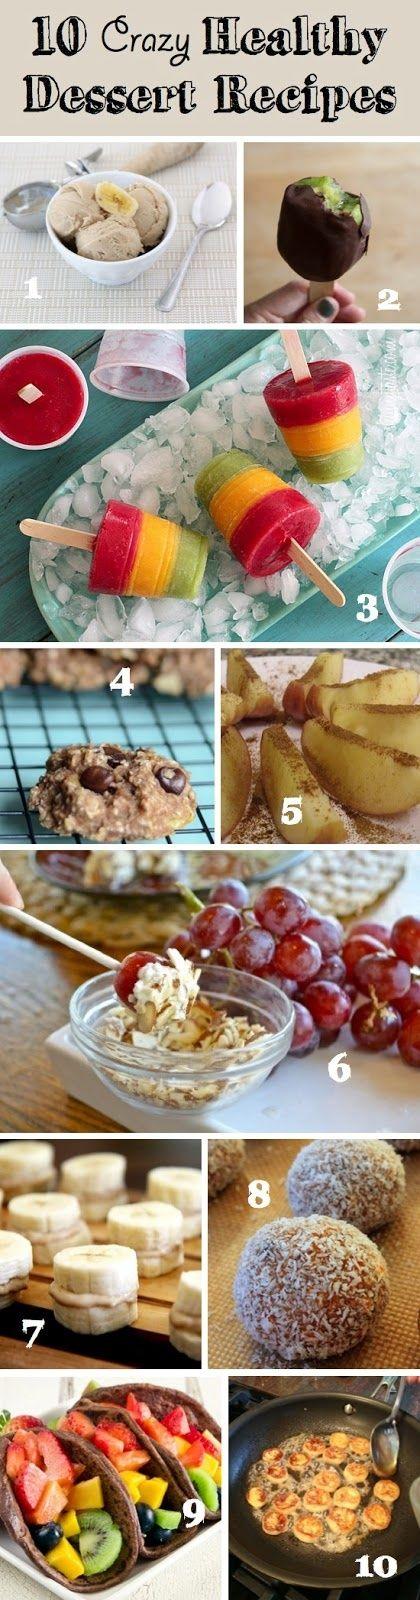 Recipe Sharing Community: 10 Crazy Healthy Dessert Ideas | Recipe Sharing | http://yourperfectdessert.blogspot.com